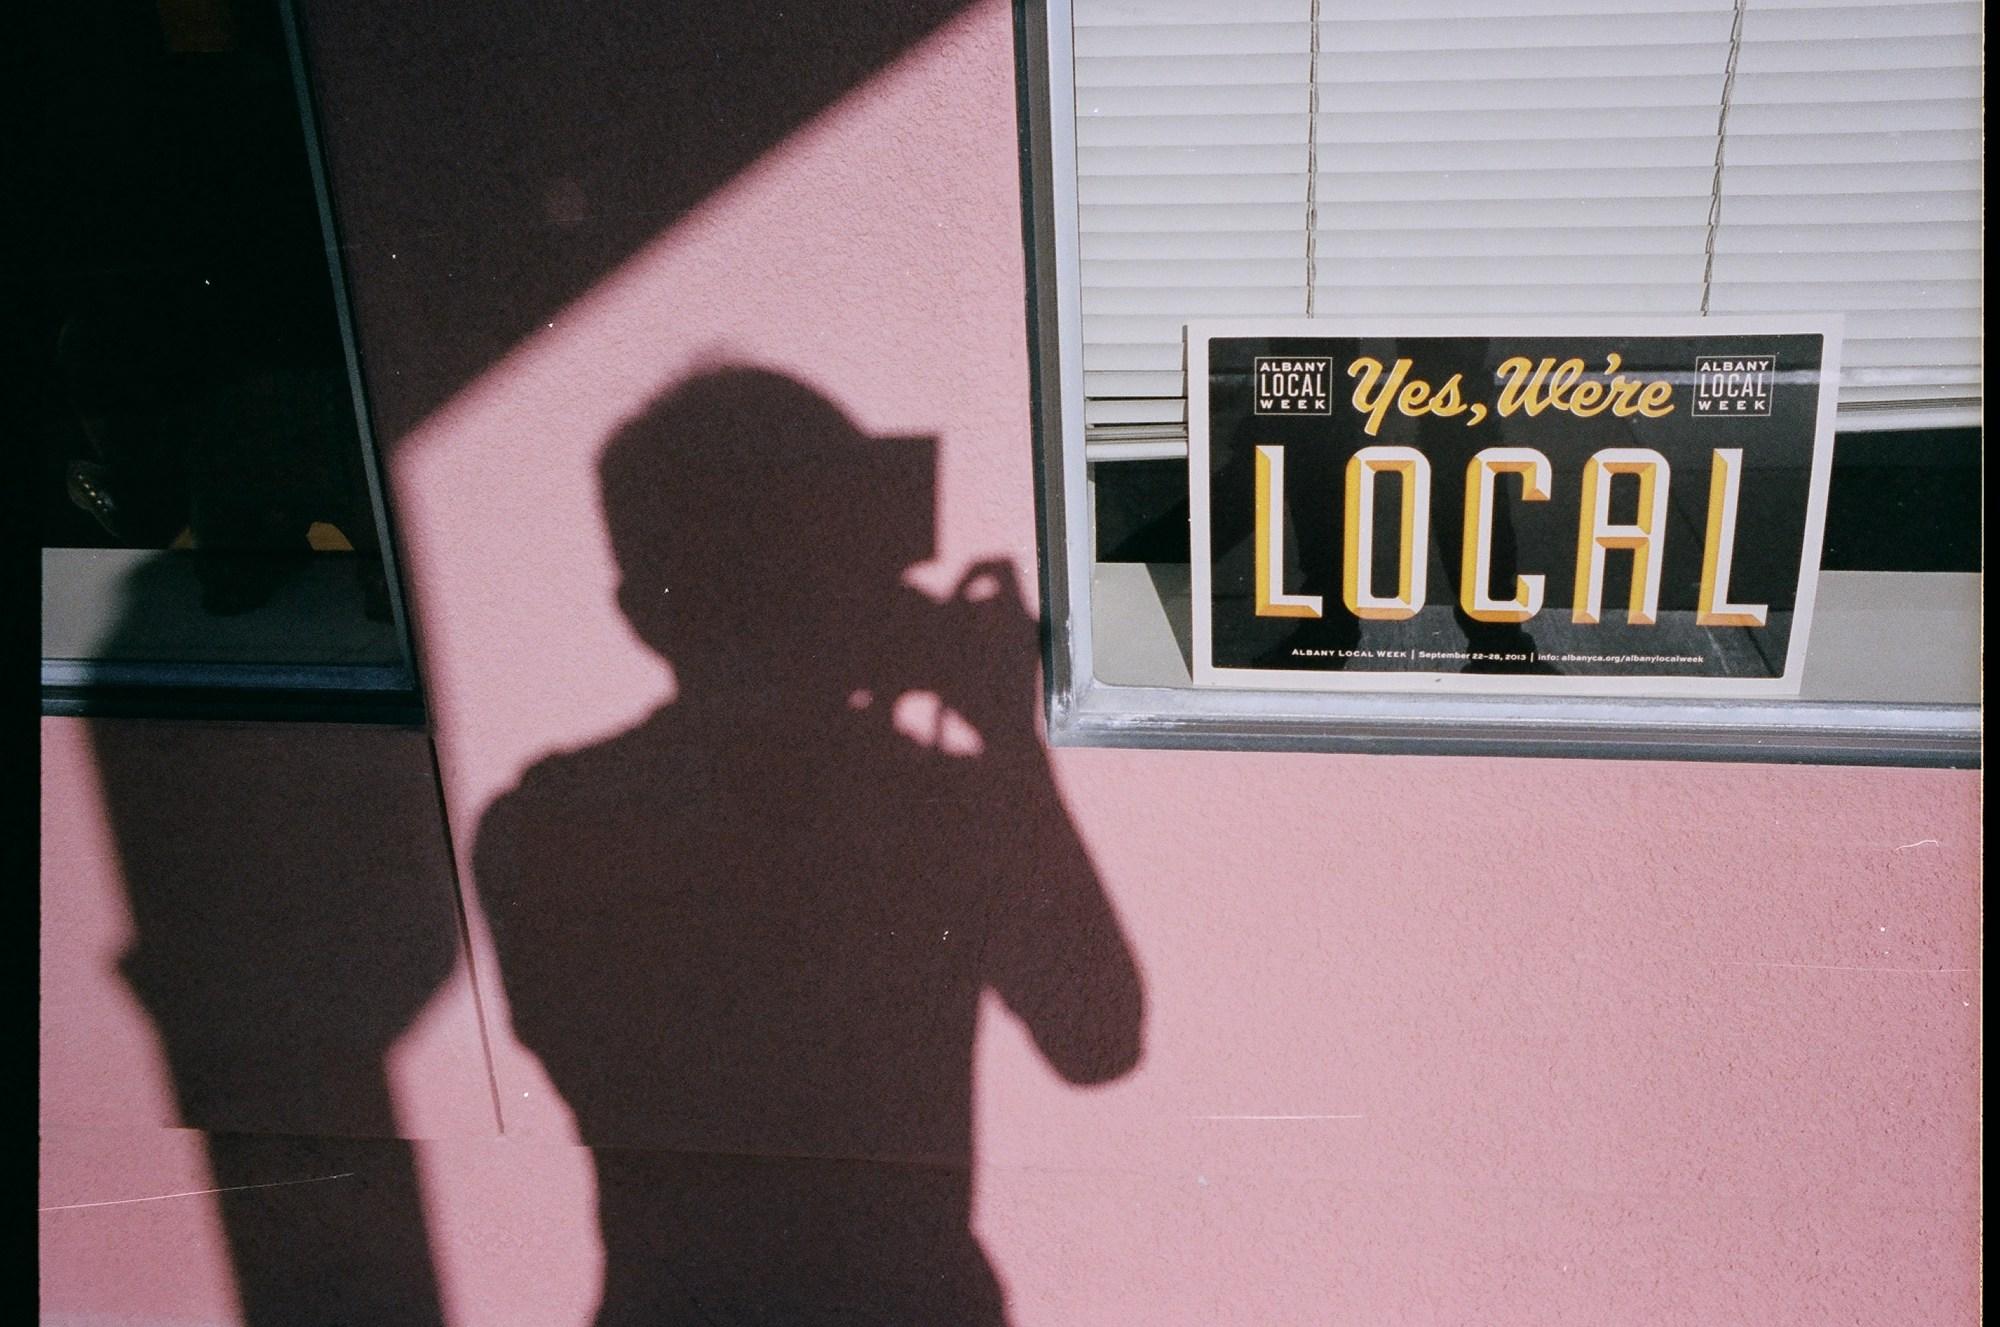 Yes, we're local. Berkeley self portrait shadow, 2013